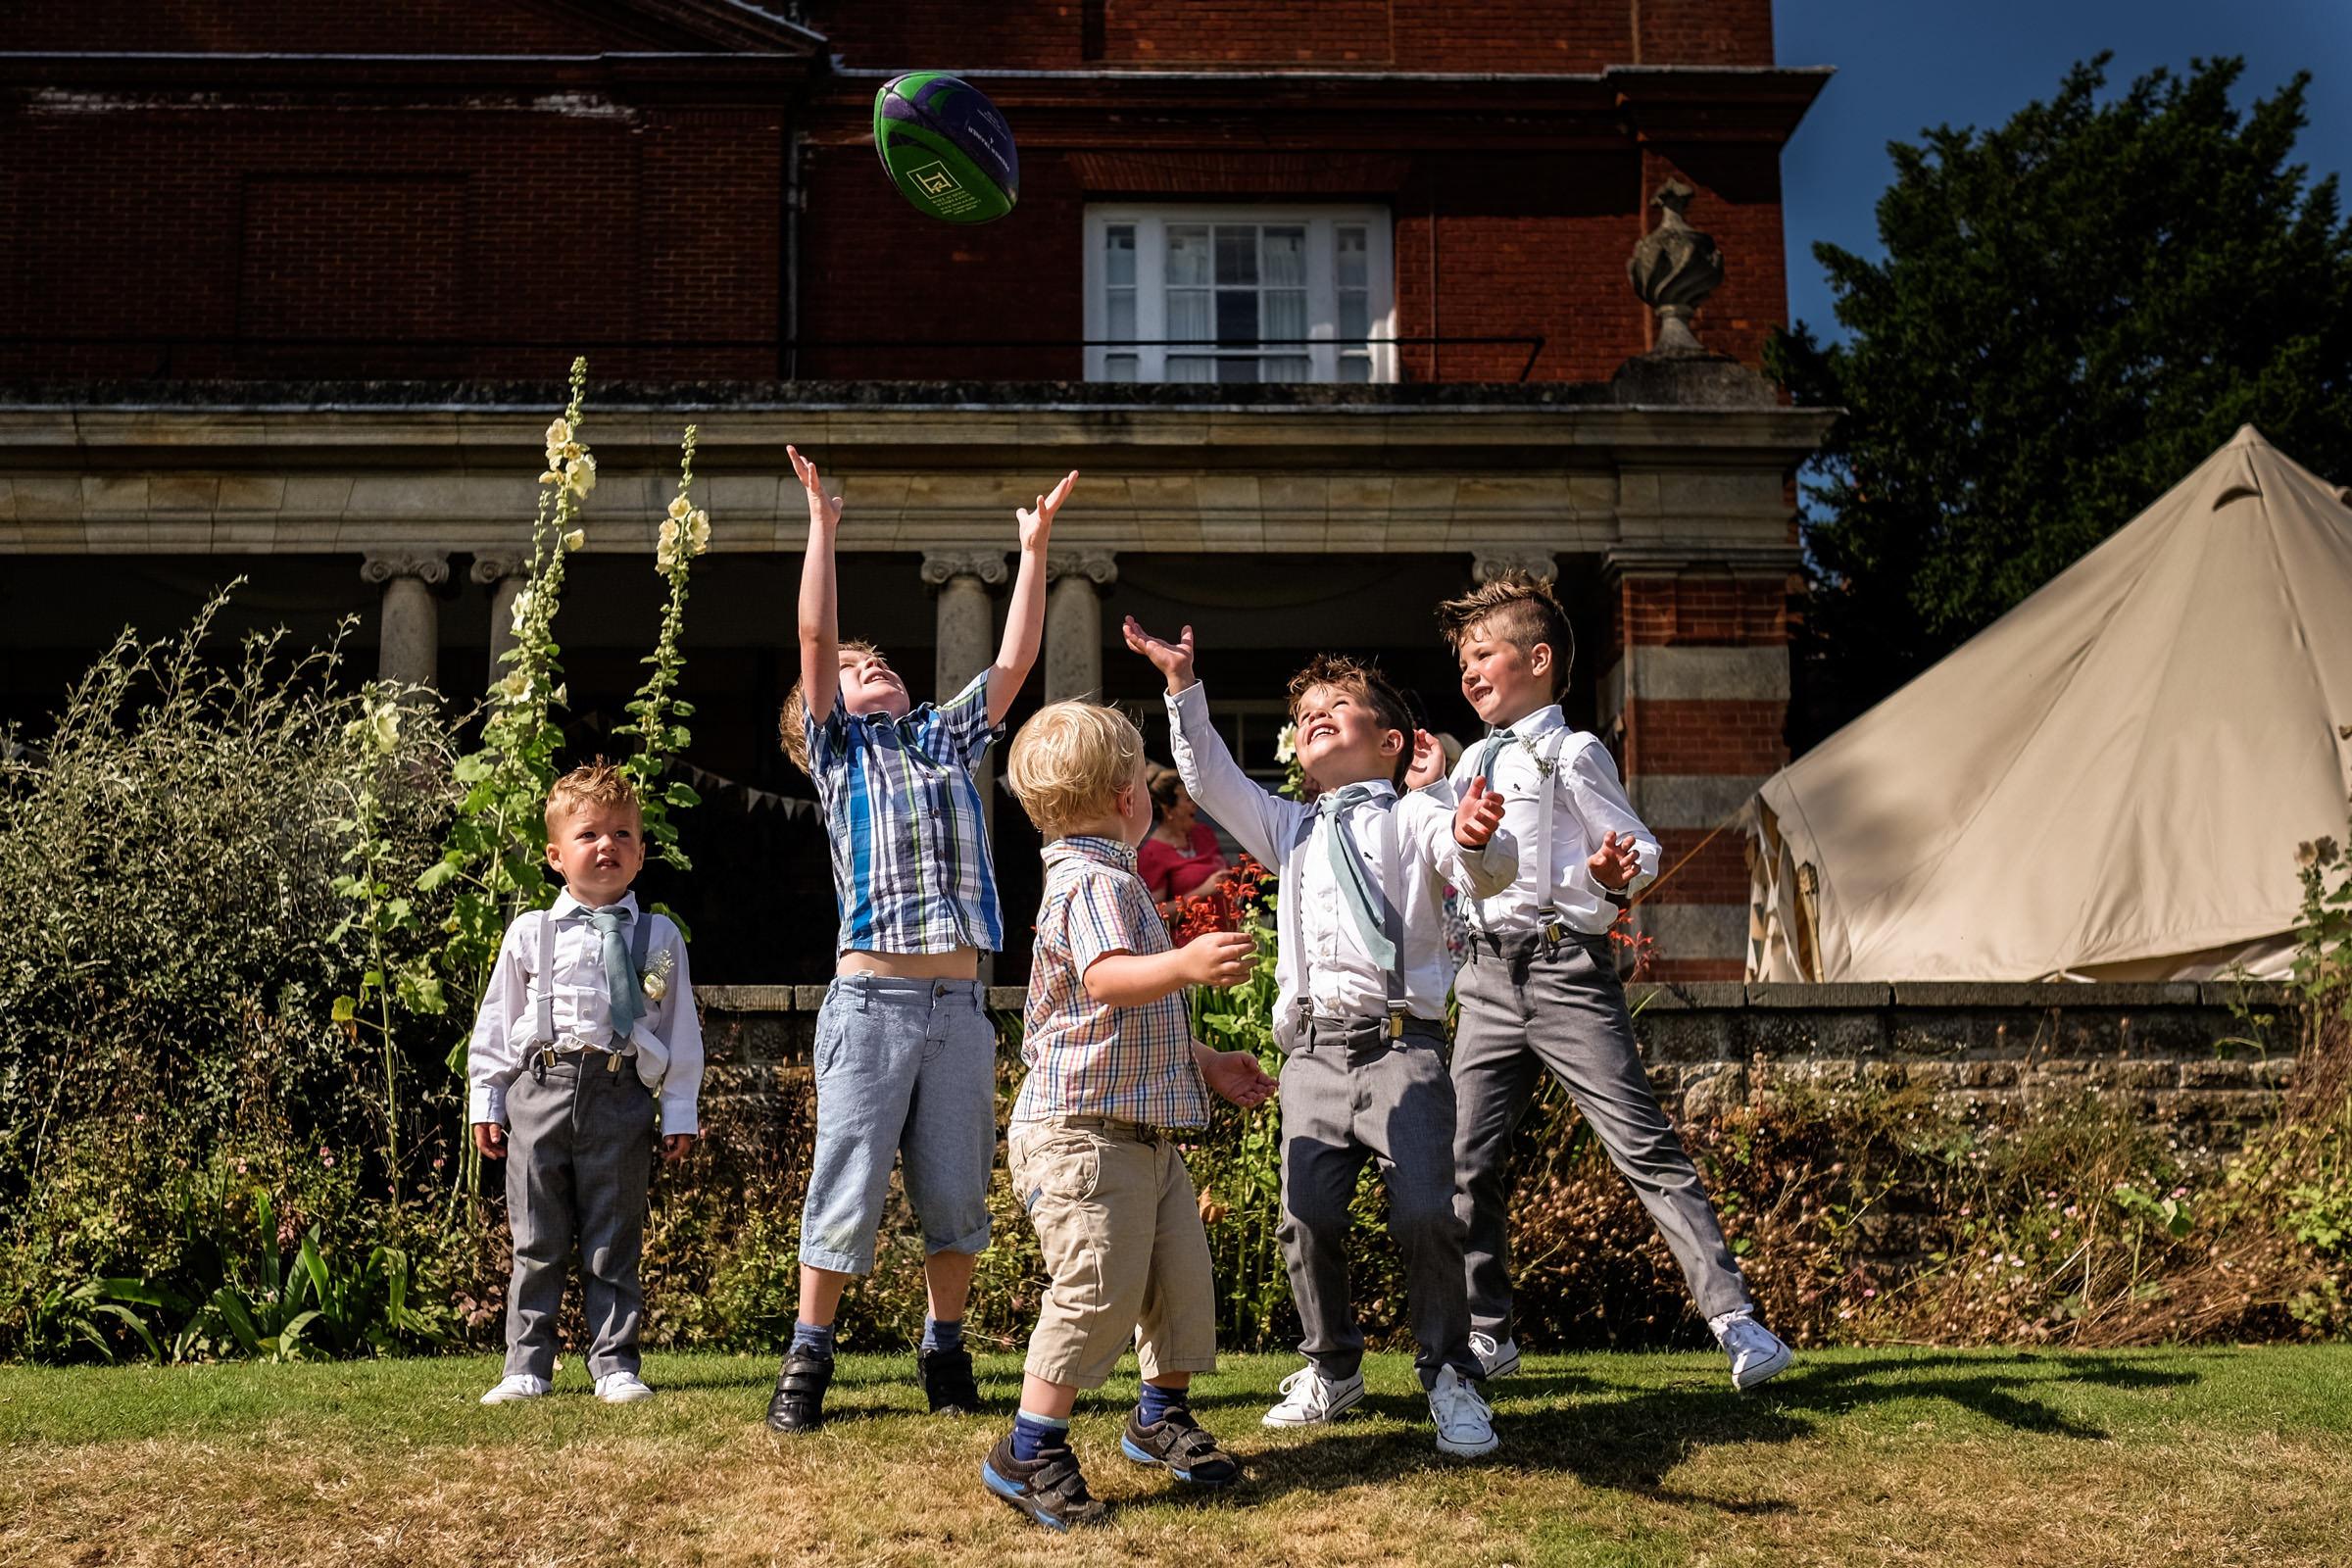 Wedding+at+Parkside+School+in+Surrey+024.jpg